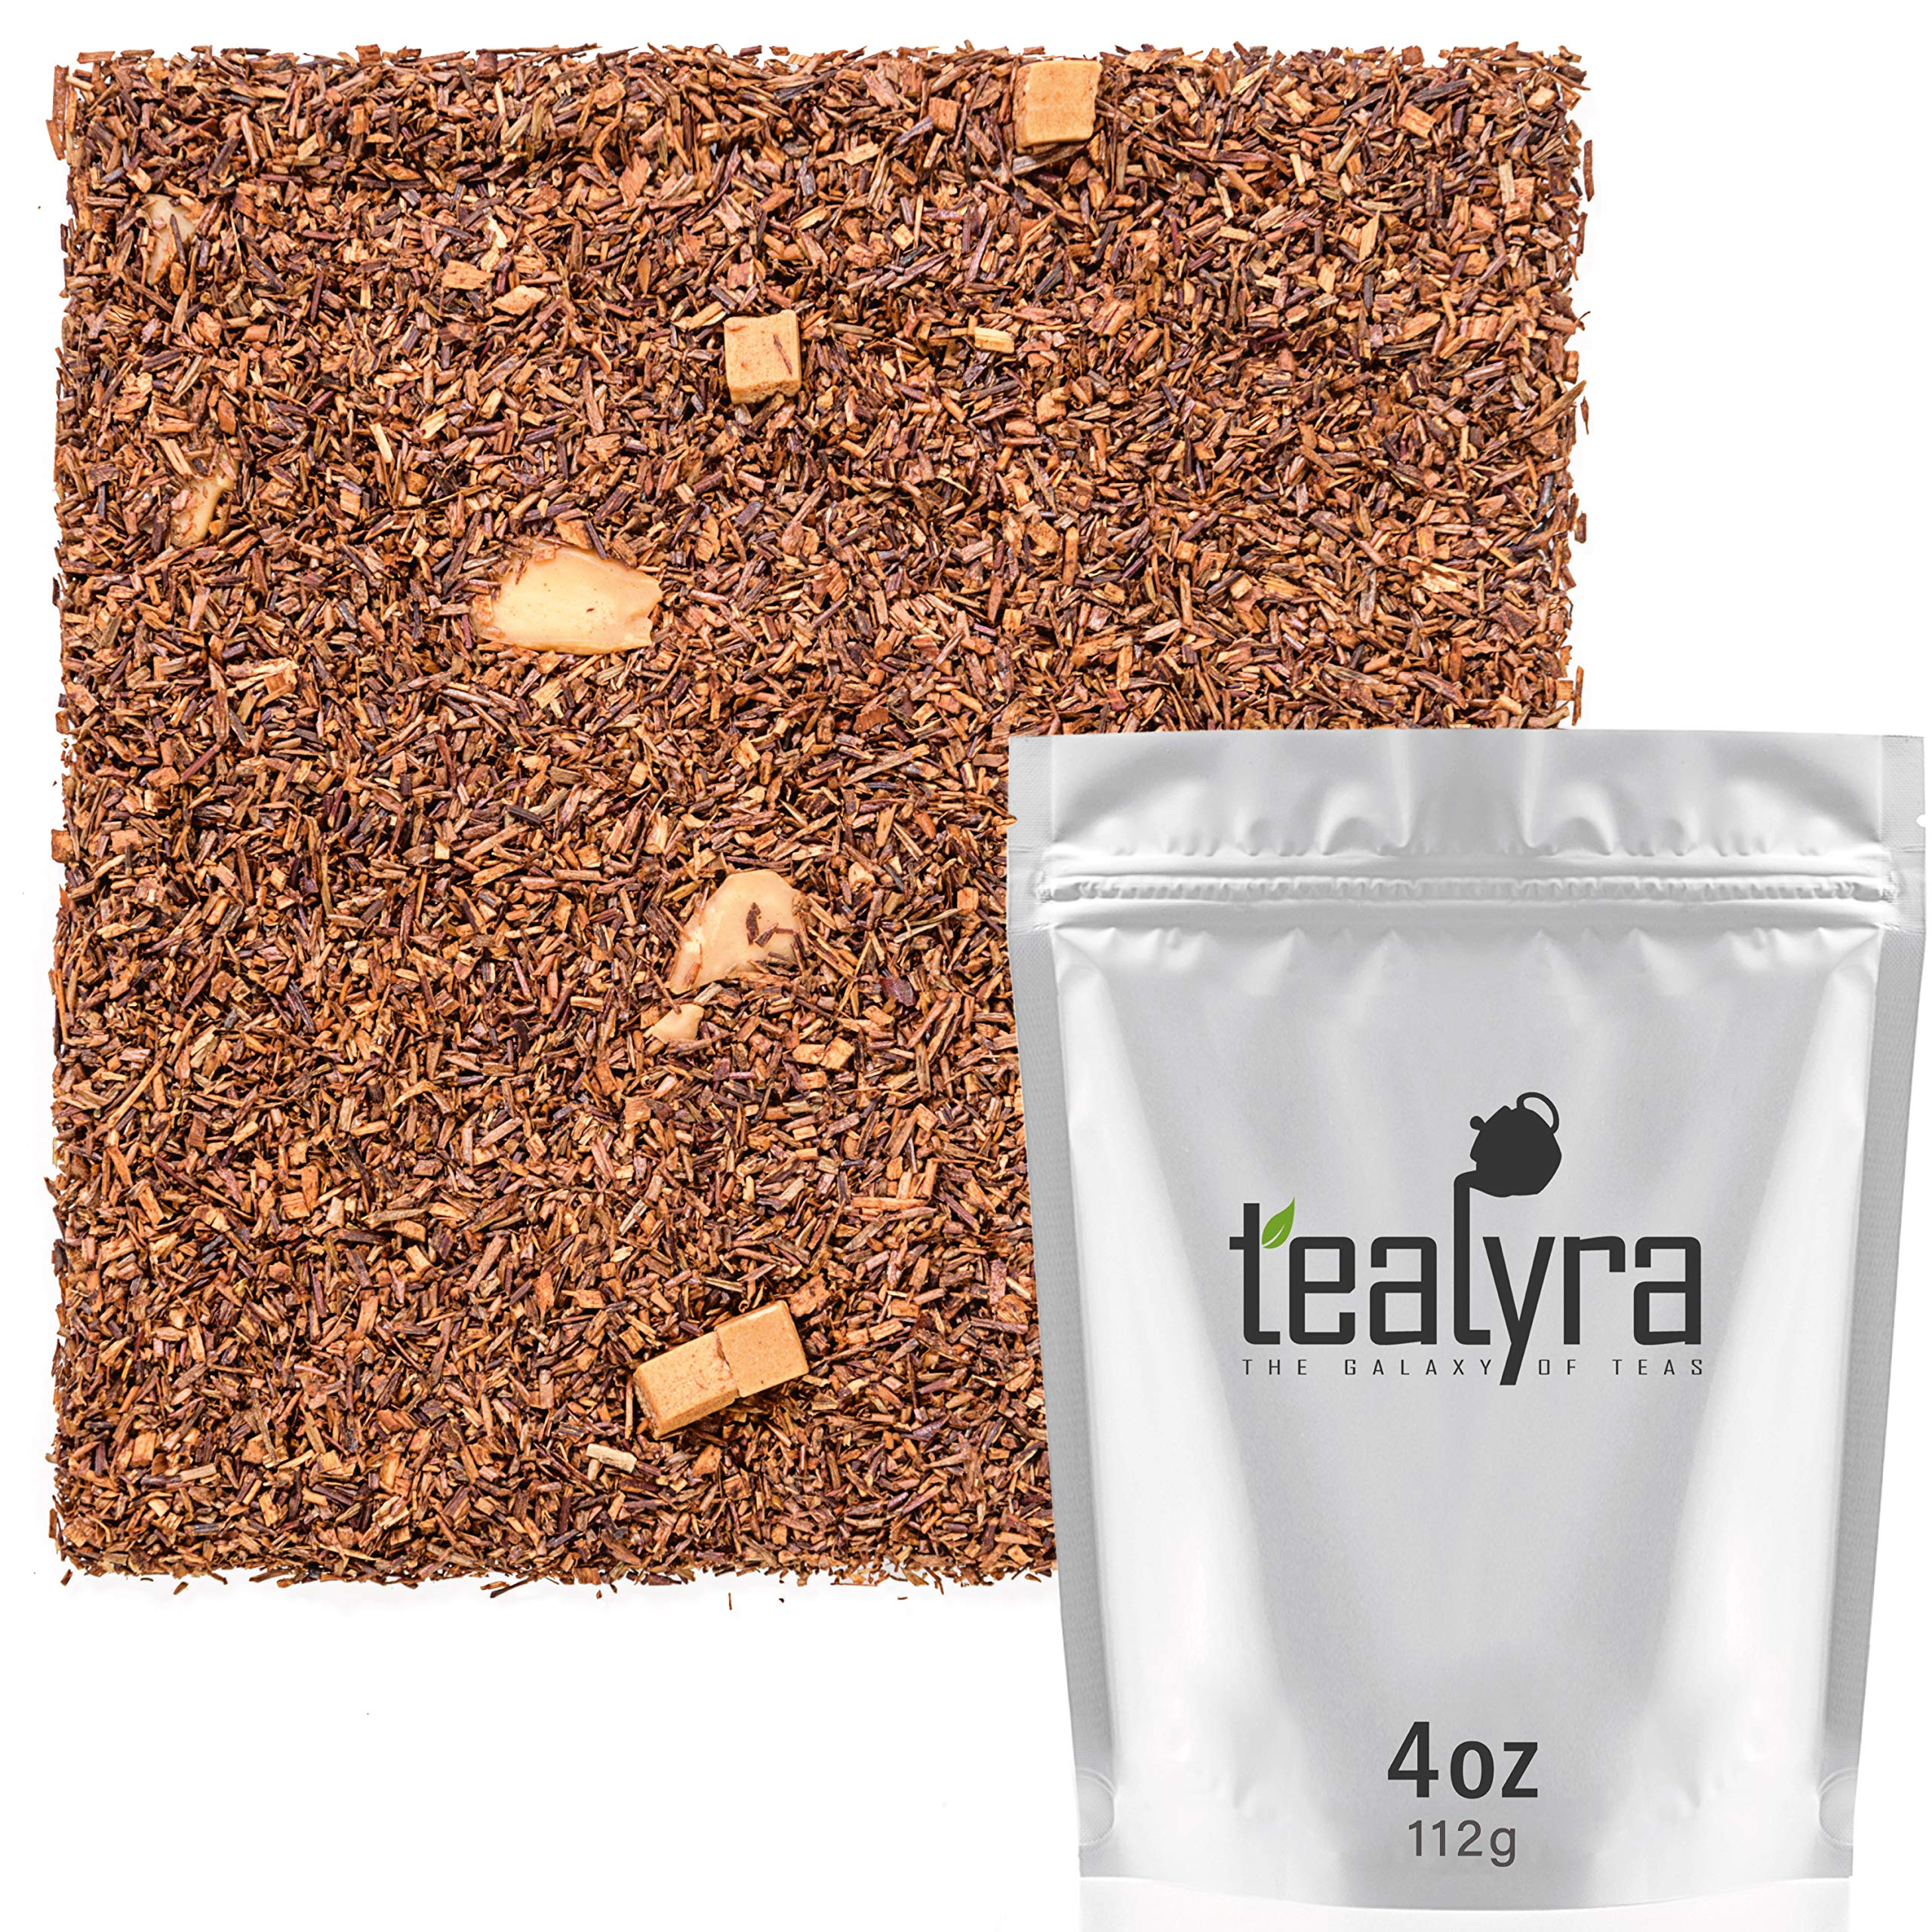 Tealyra - Rooibos Toffee Caramel - Red Bush Herbal Leaves Tea - Cocoa - Almond - Loose Leaf Tea - Caffeine Free - 112g (4-ounce)